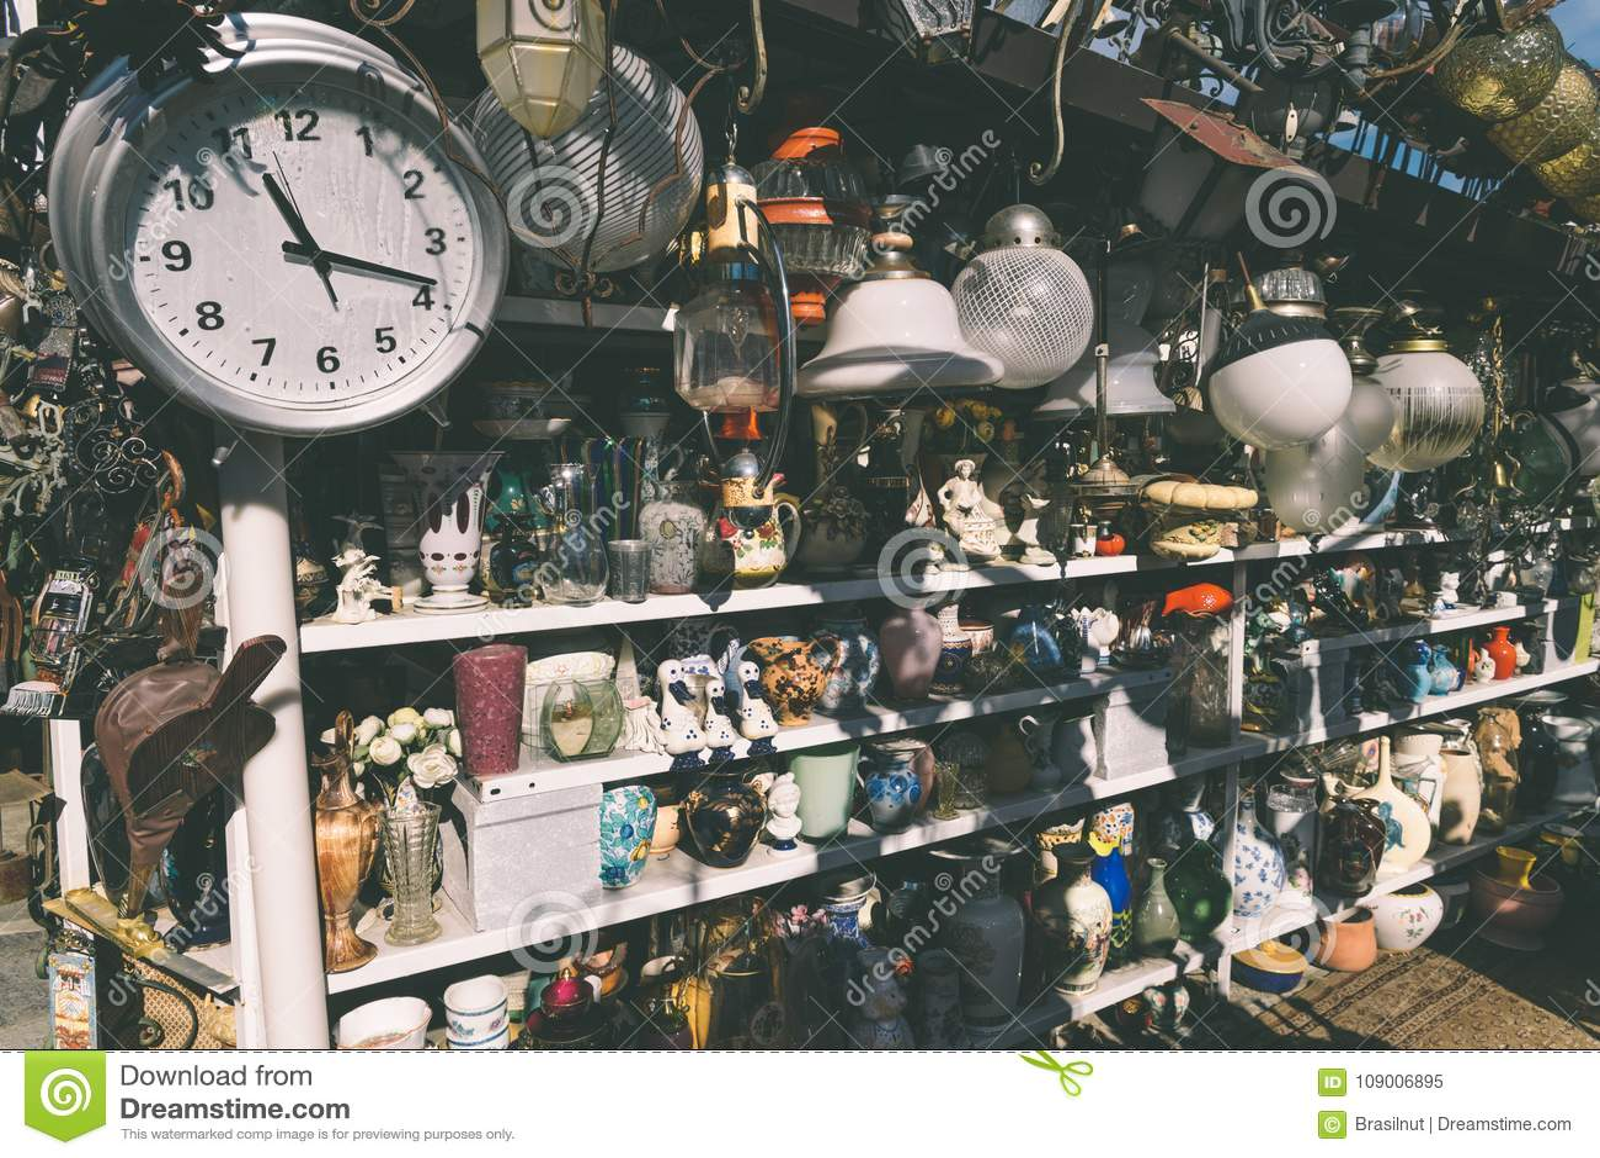 Flea market goods on display